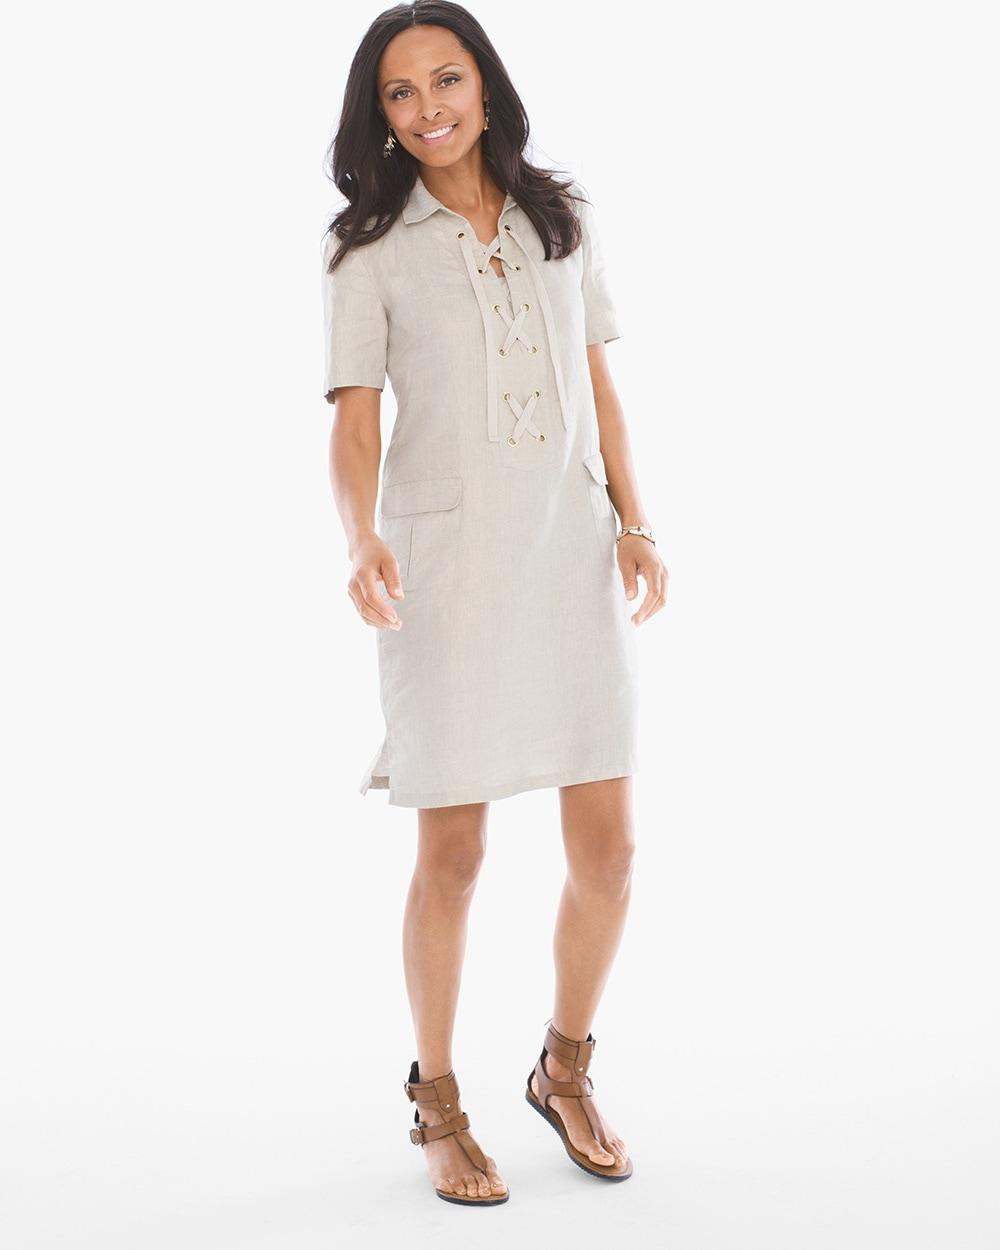 Clothing Women S Dresses Skirts Chico S